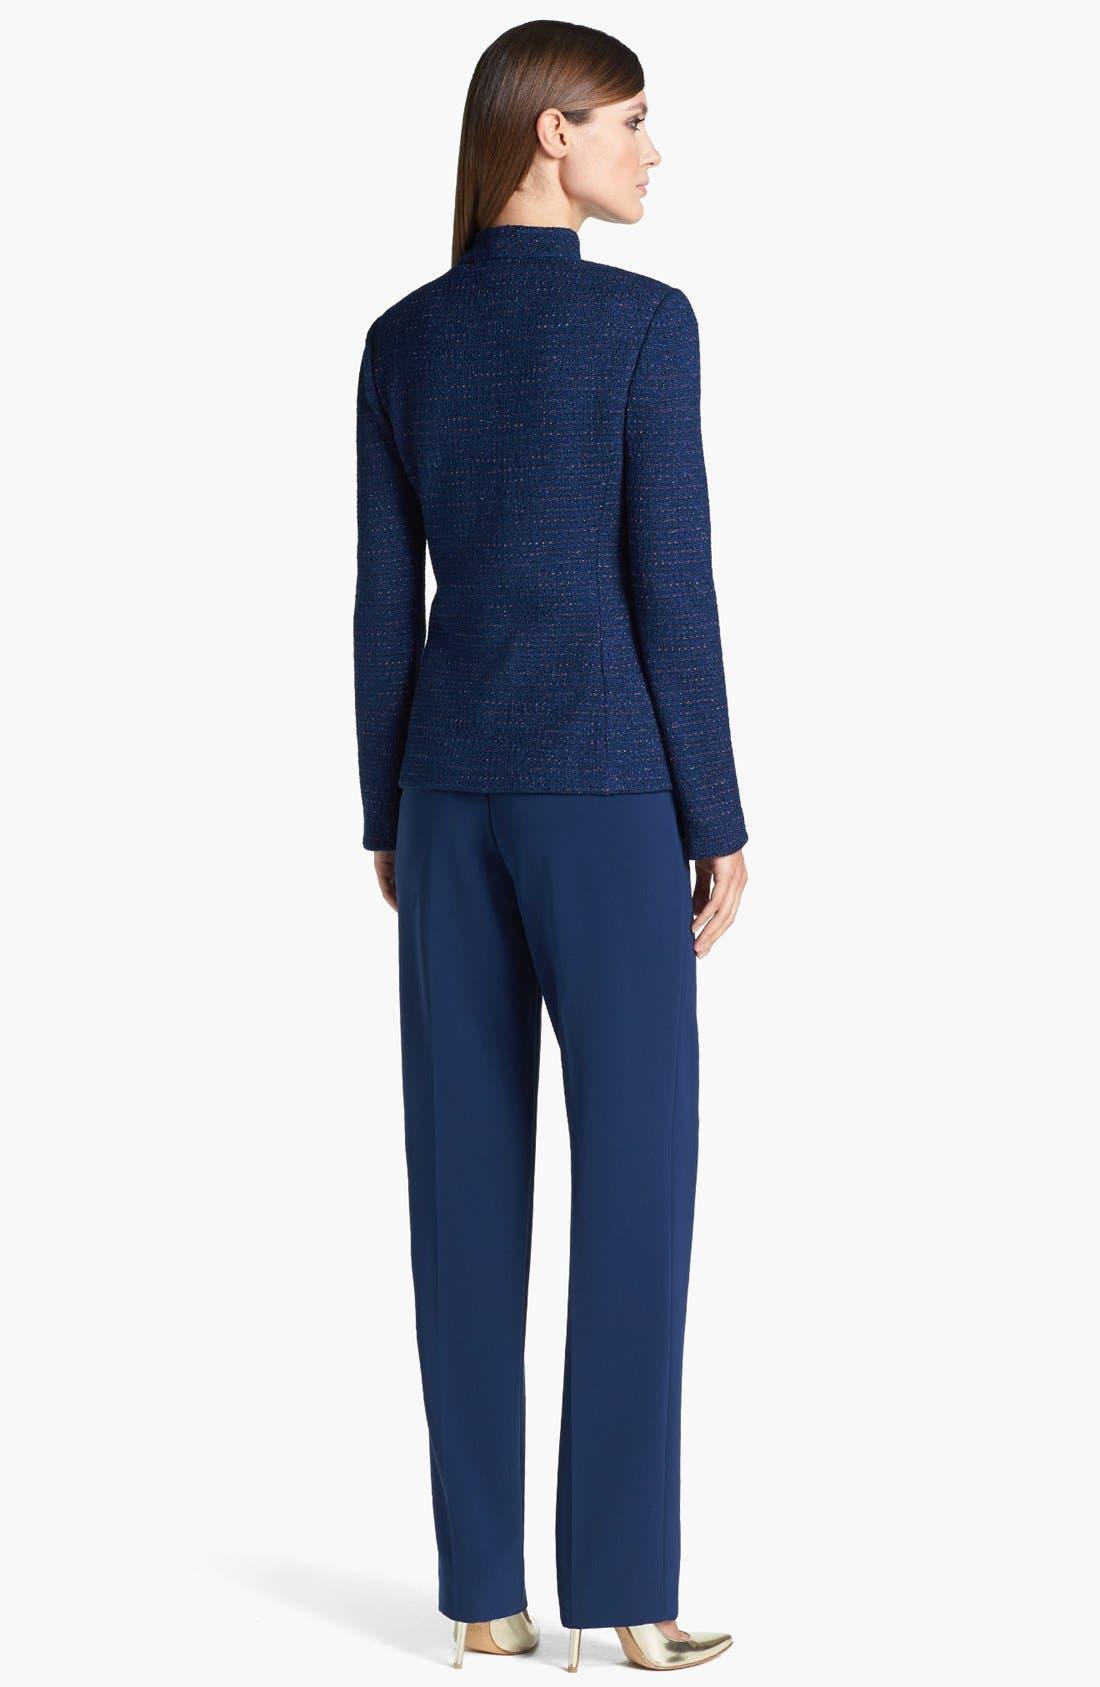 Alternate Image 3  - St. John Collection Novelty Dot Tweed Fitted Jacket